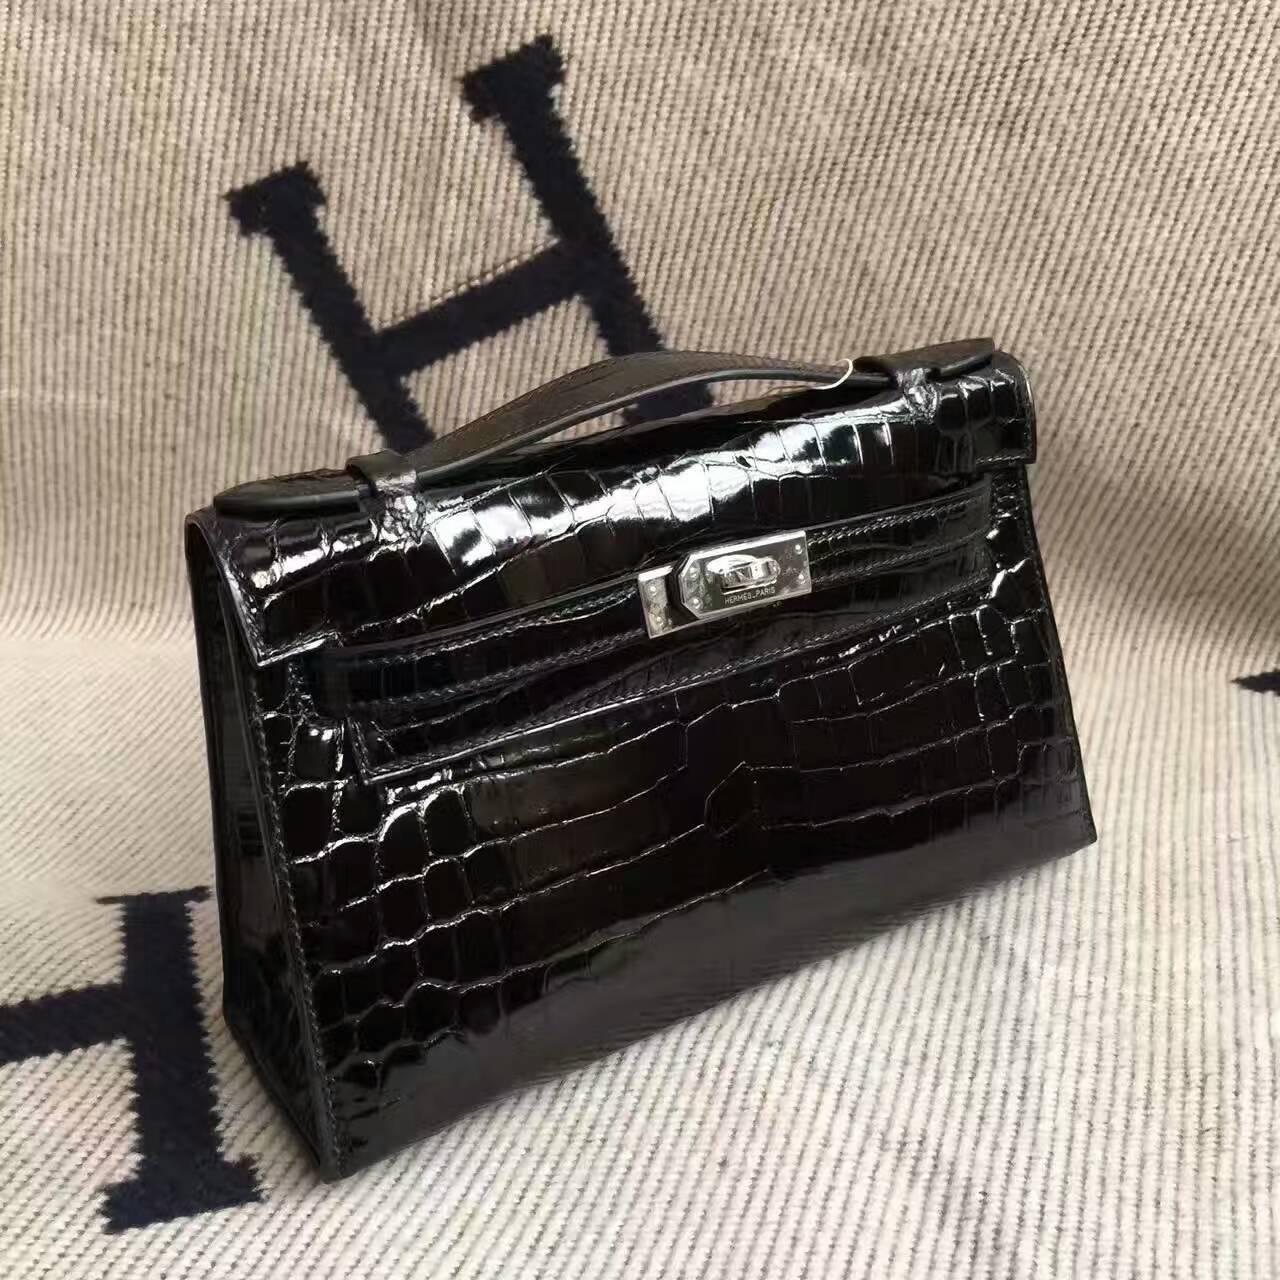 Discount Hermes CK89 Black Crocodile Shiny Leather Minikelly Clutch Bag22cm